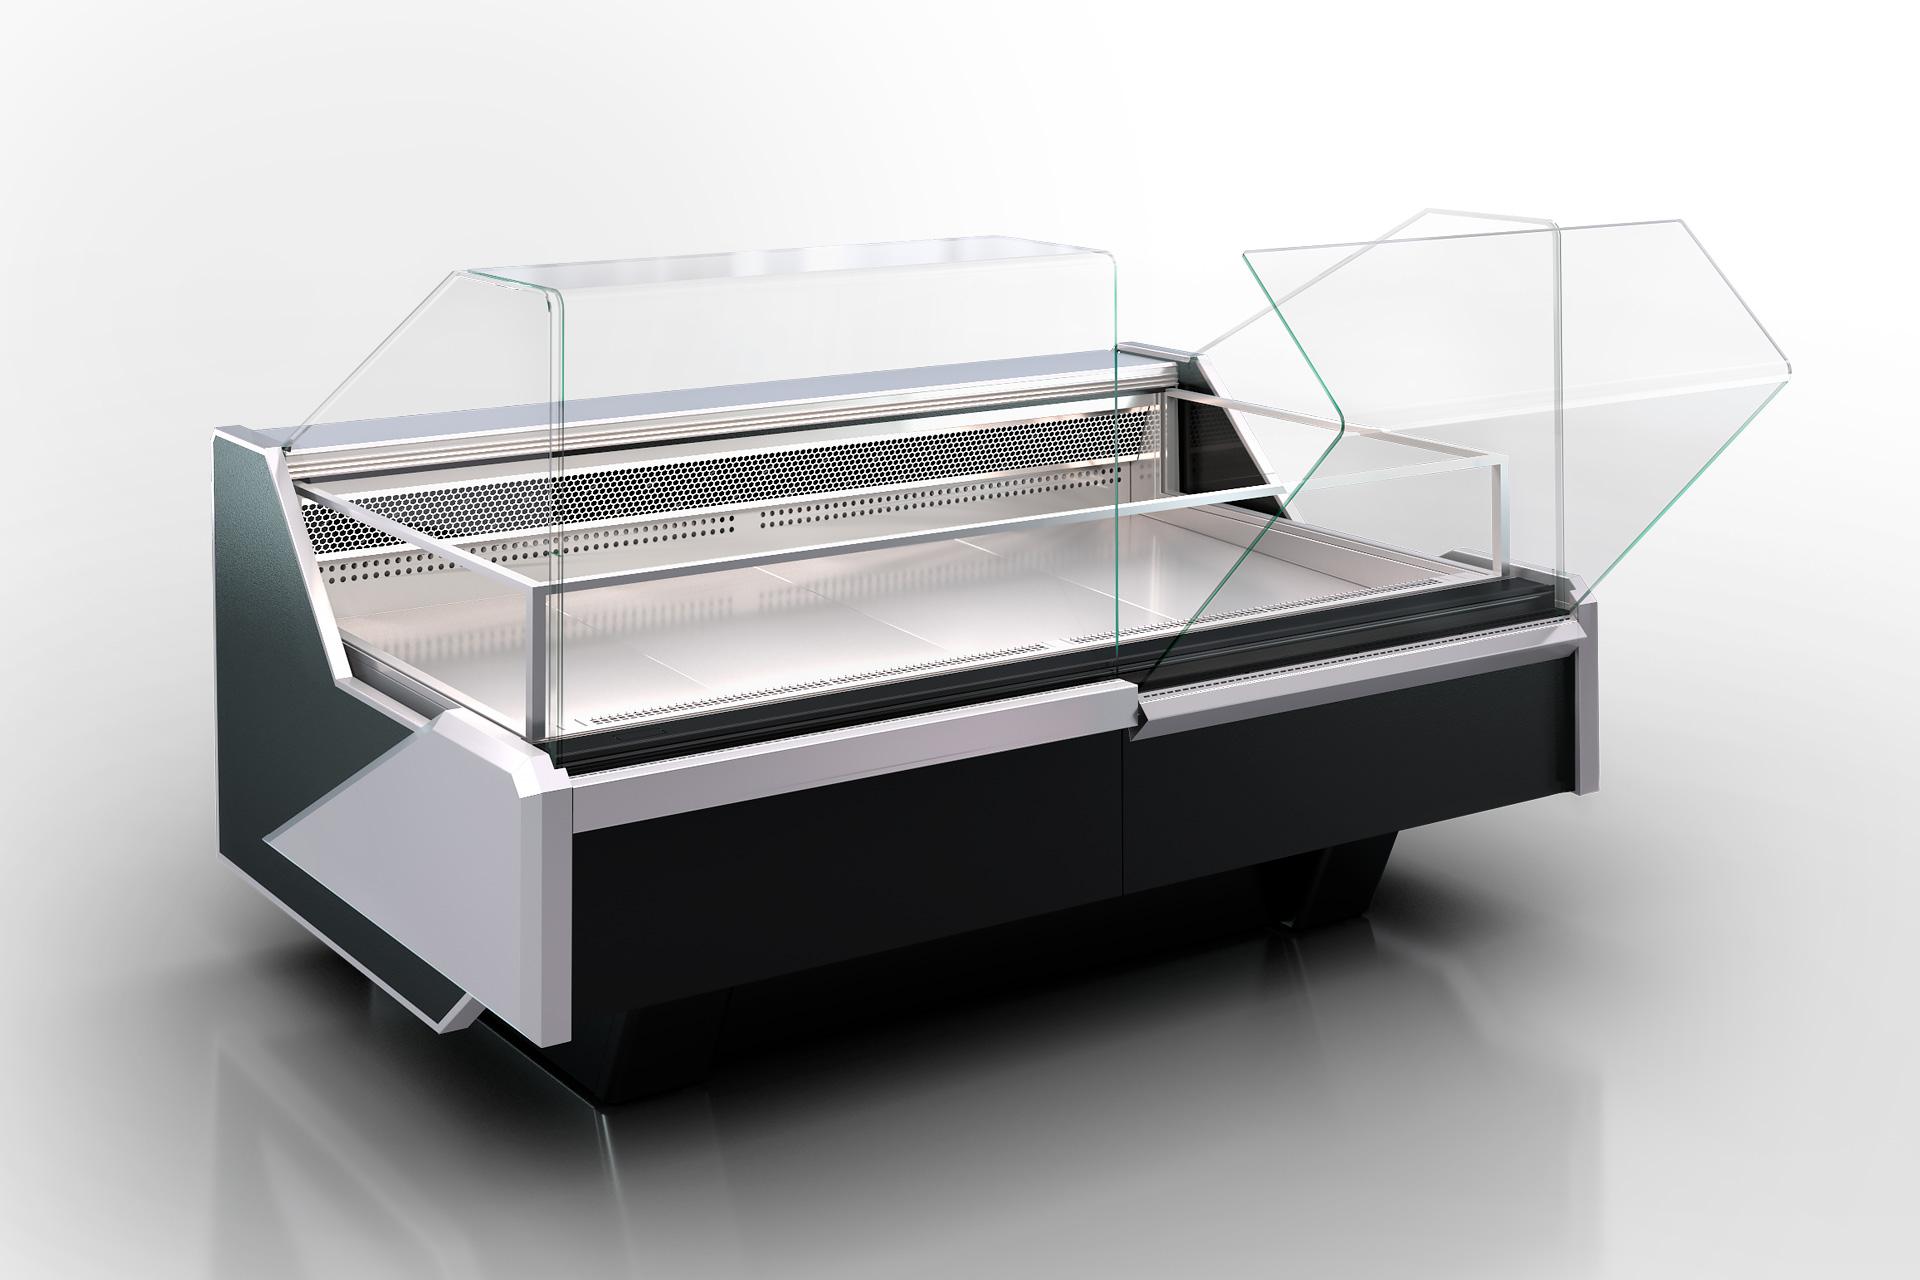 Refrigerated counters Missouri enigma MC 122 LT OS 115-DLM